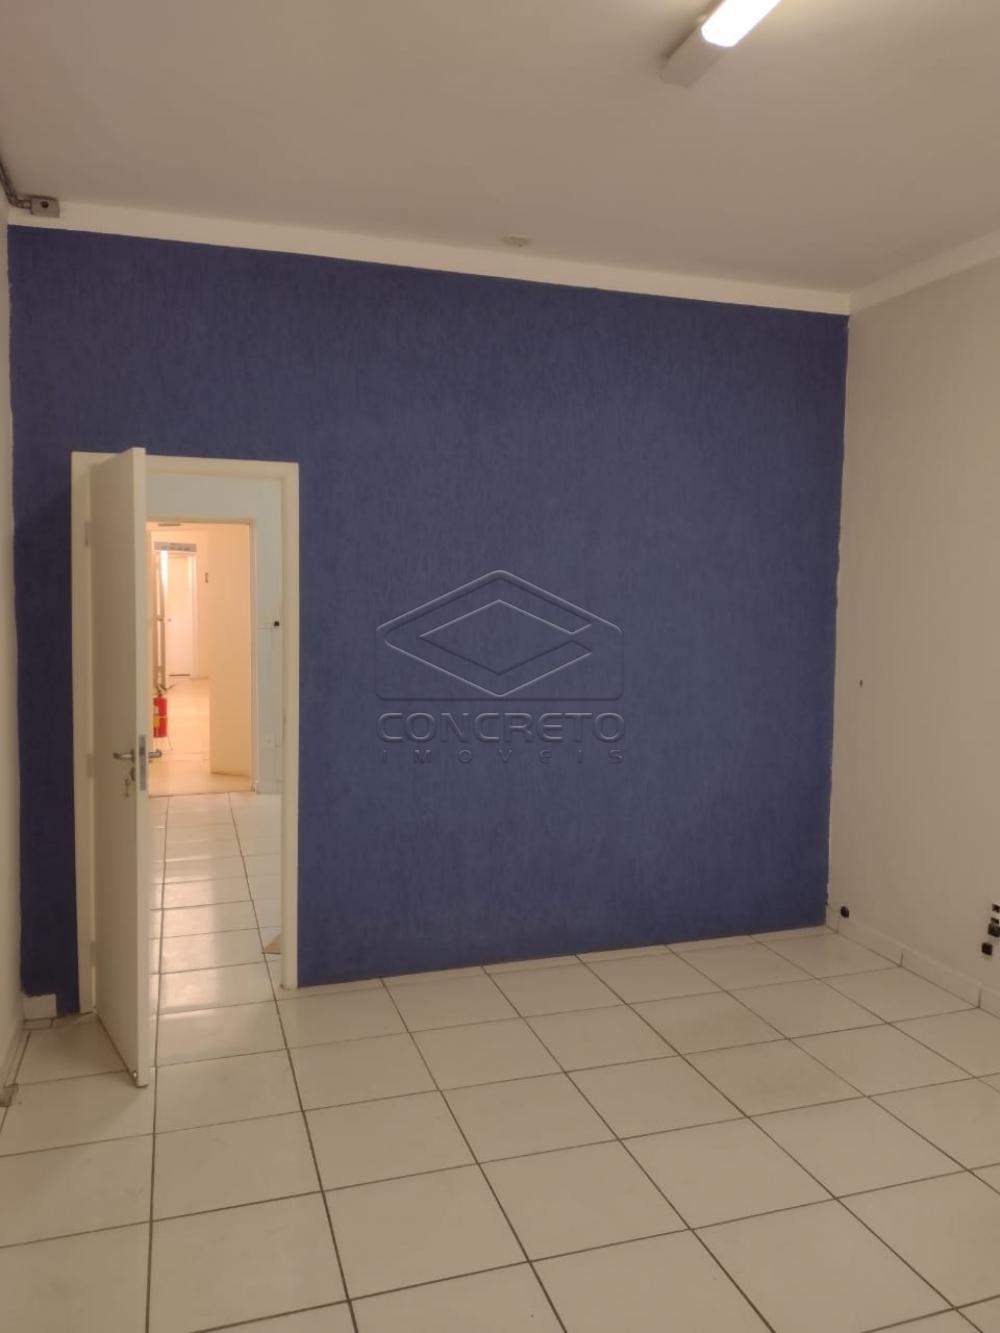 Comprar Comercial / Sala em Bauru apenas R$ 50.000,00 - Foto 4